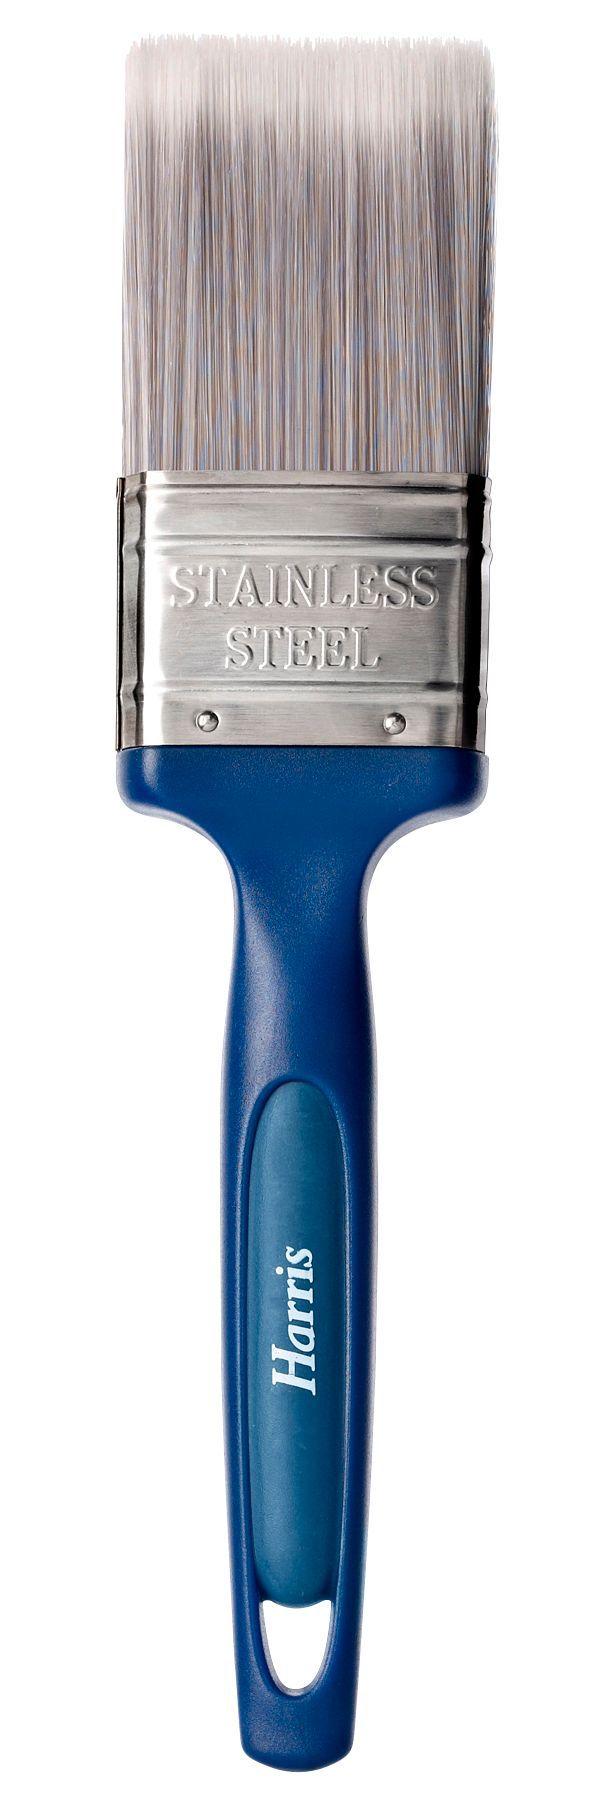 Harris Precision Tip Paint Brush Diy